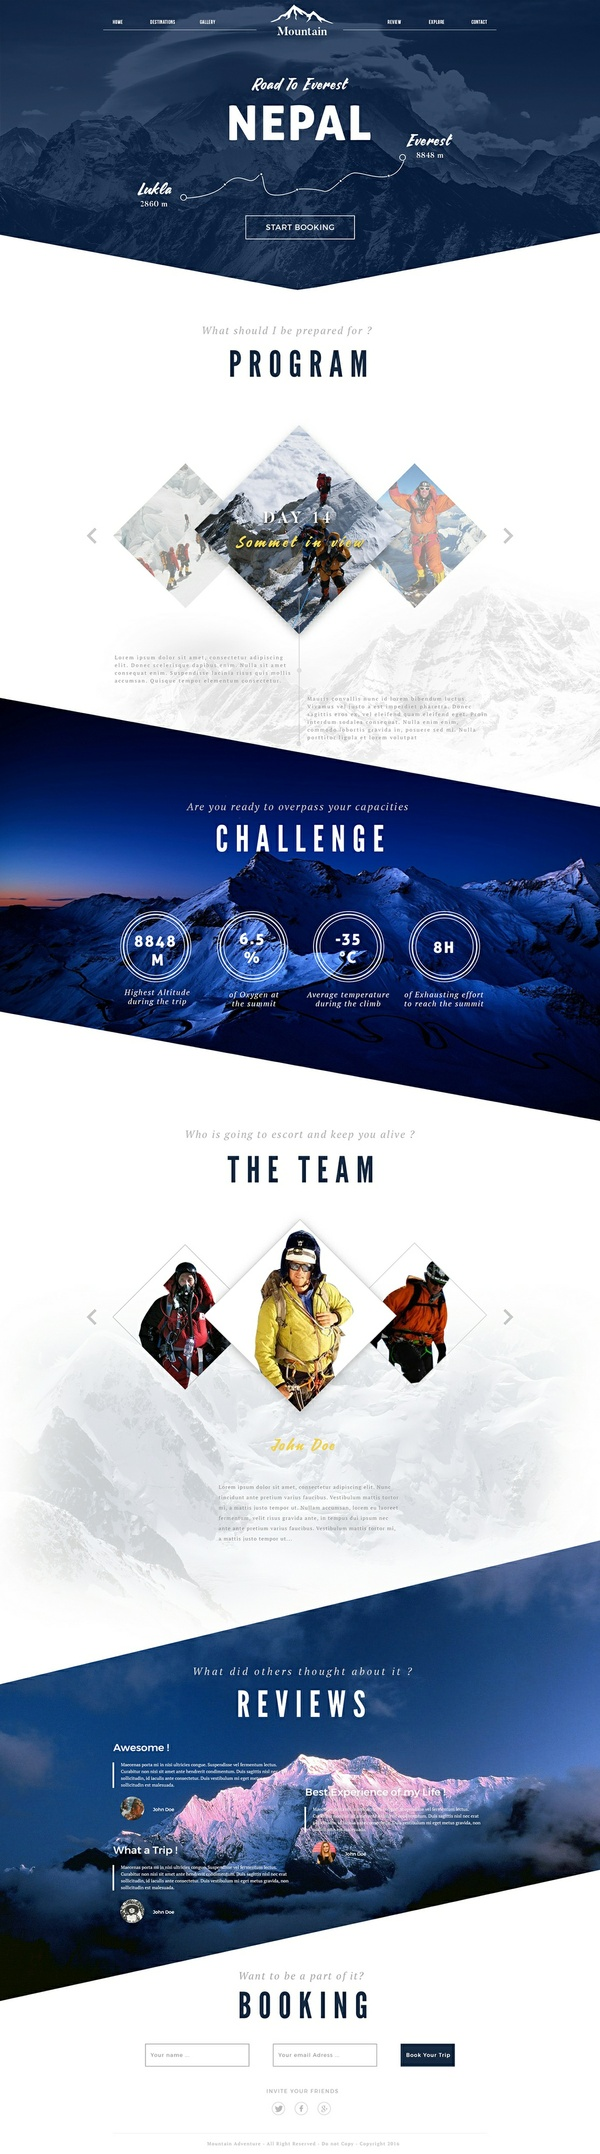 Webdesign Template - Mountain Booking Travel Website